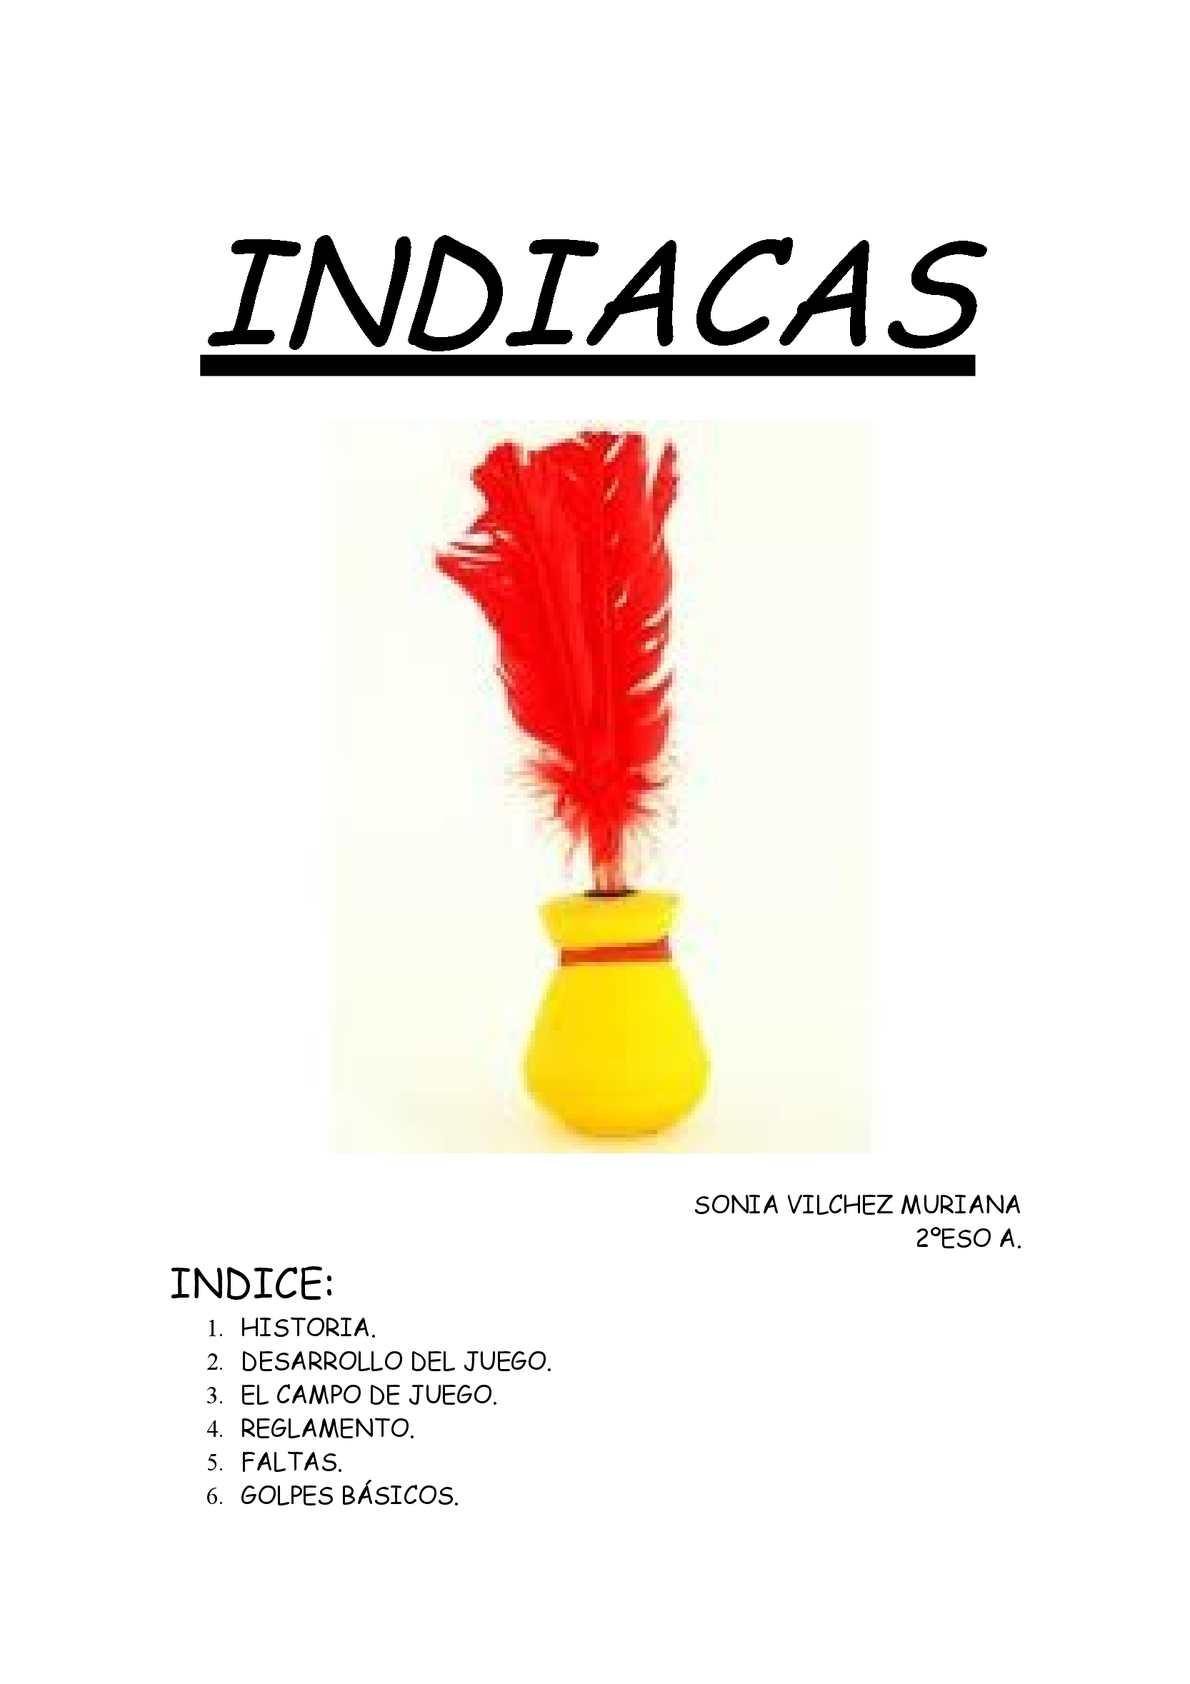 Calameo Indiacas